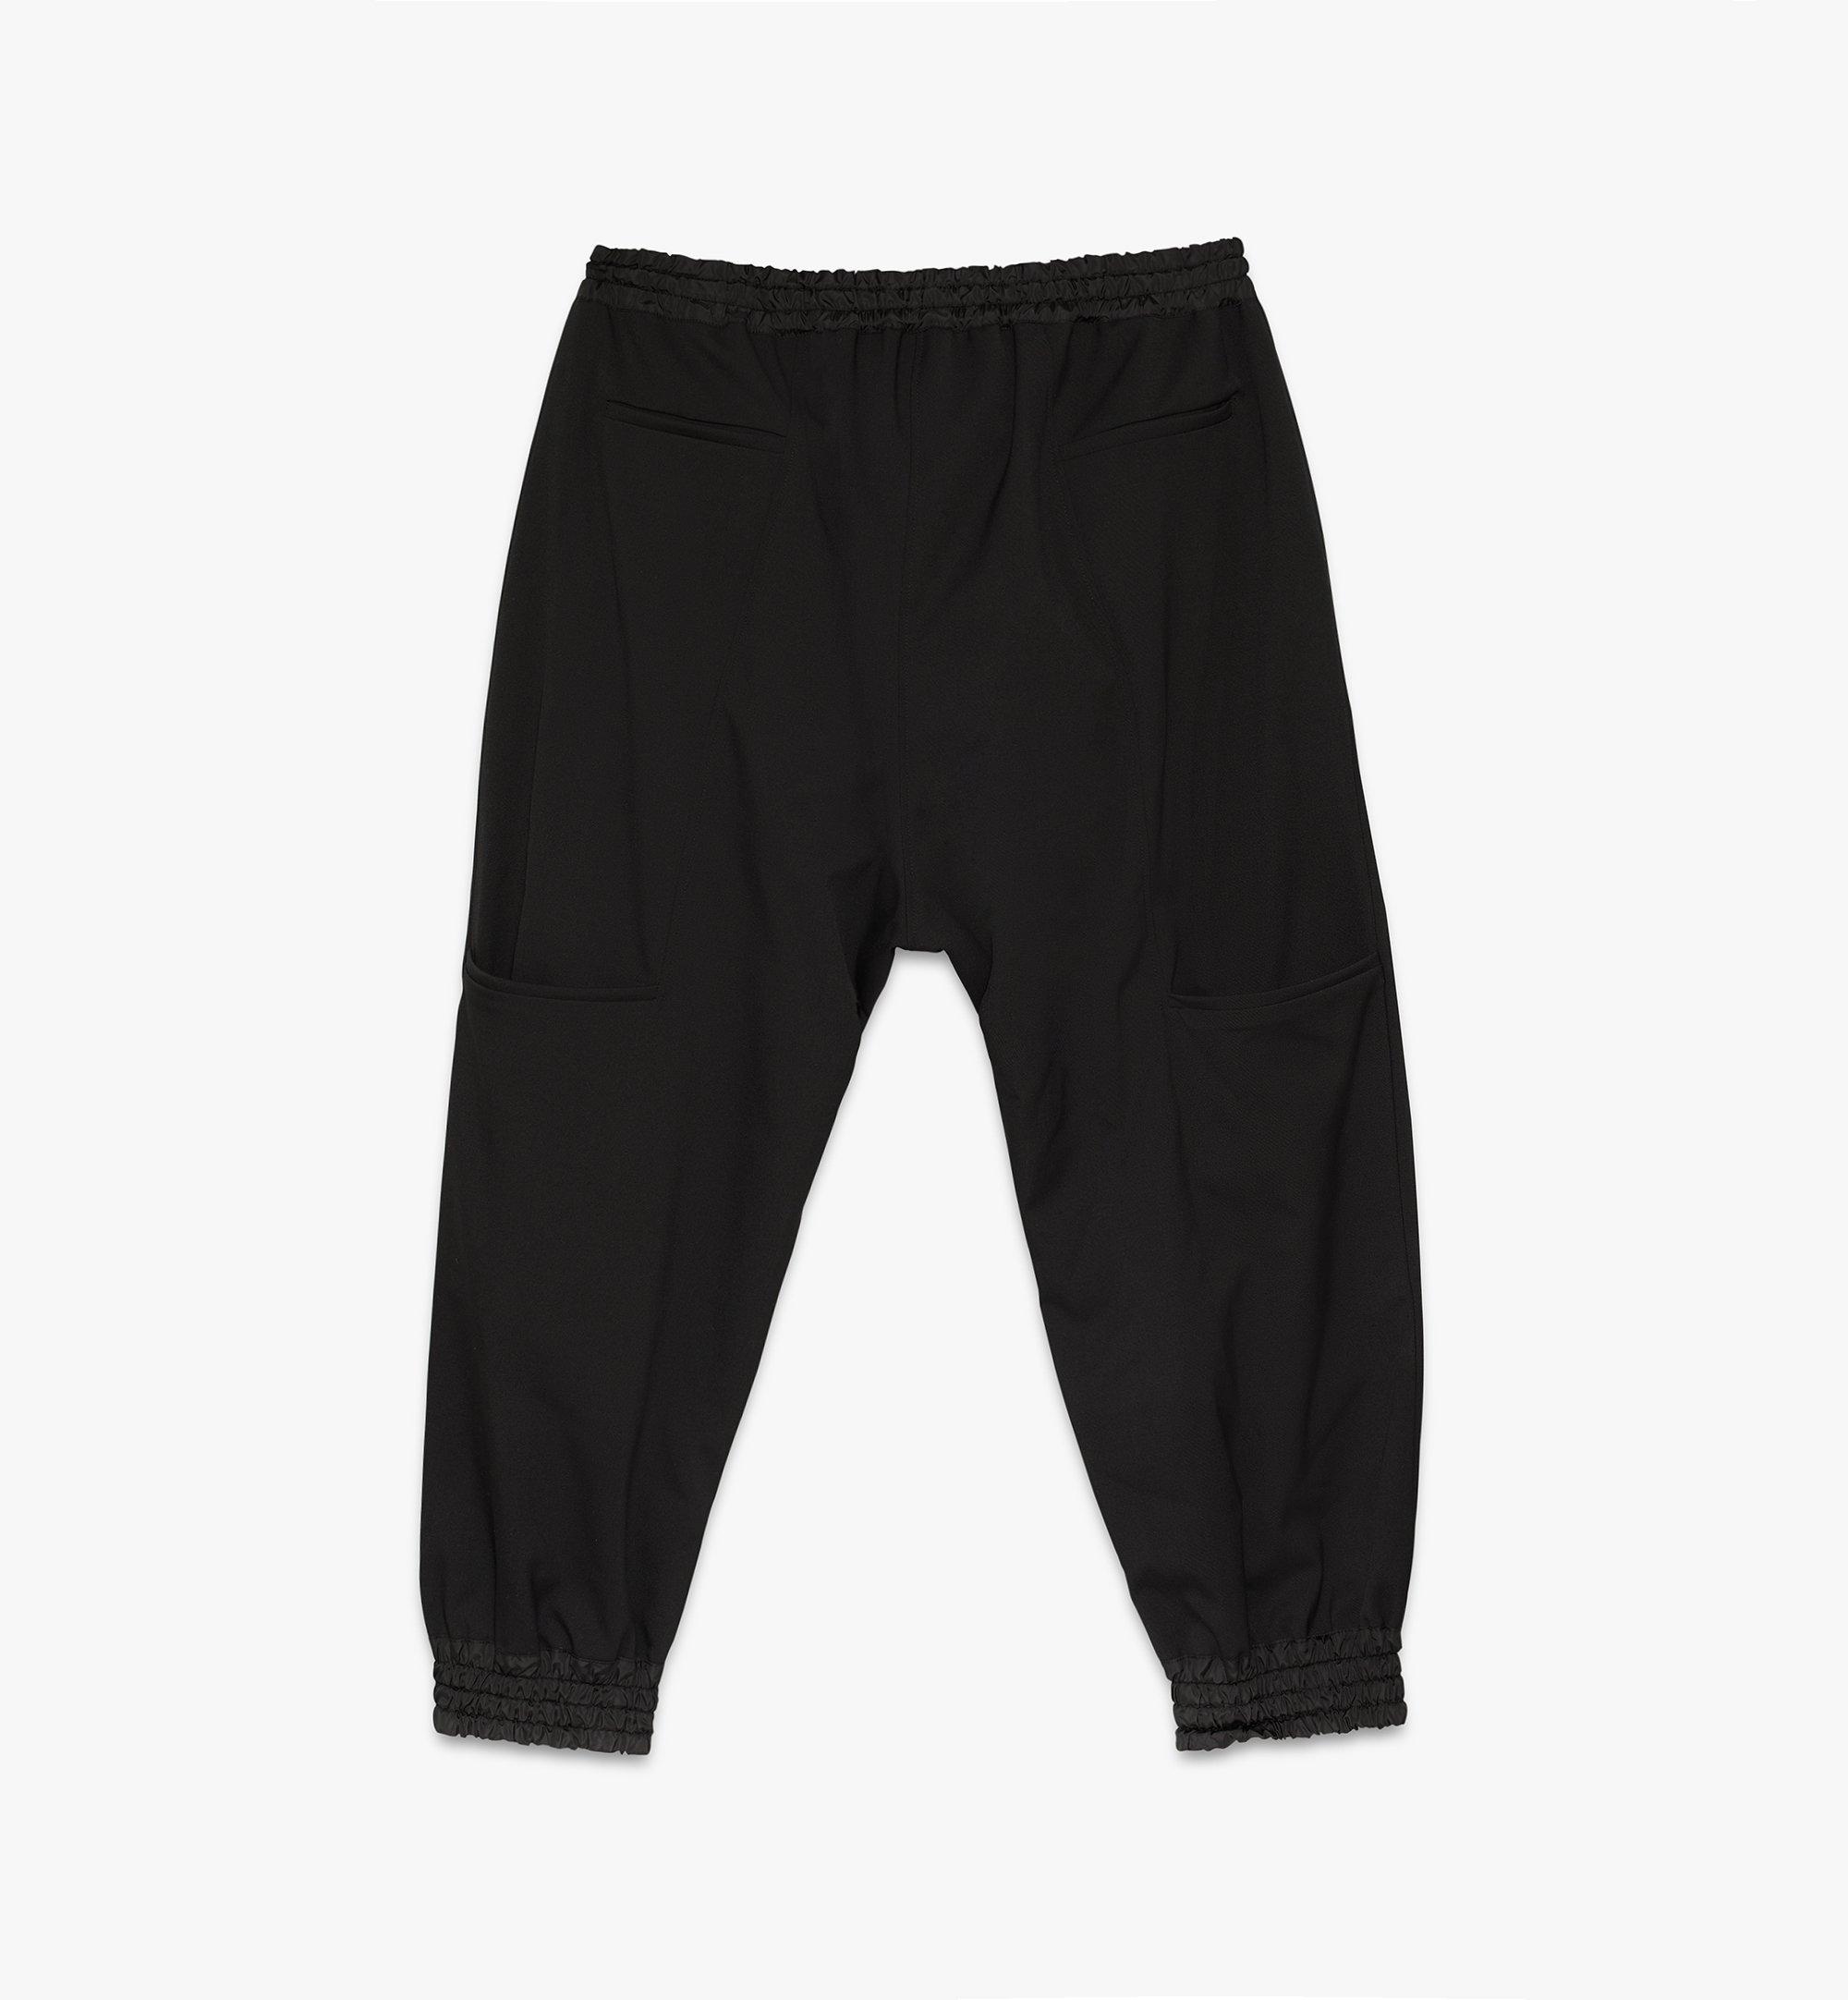 MCM 男士 1976 羊毛工裝褲 Black MHPASMV08BT048 更多視圖 1